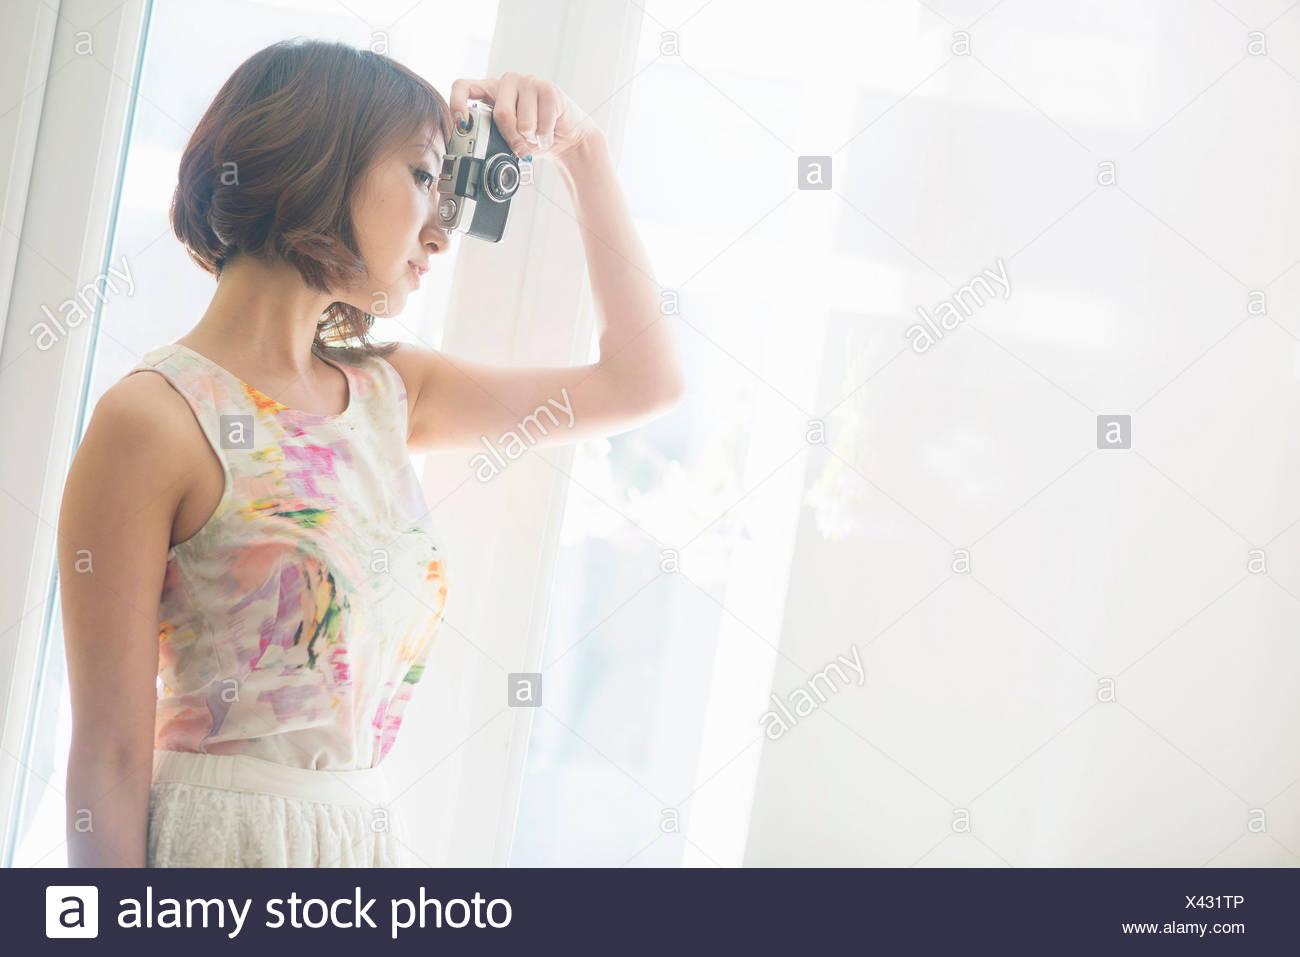 Woman looking through camera - Stock Image